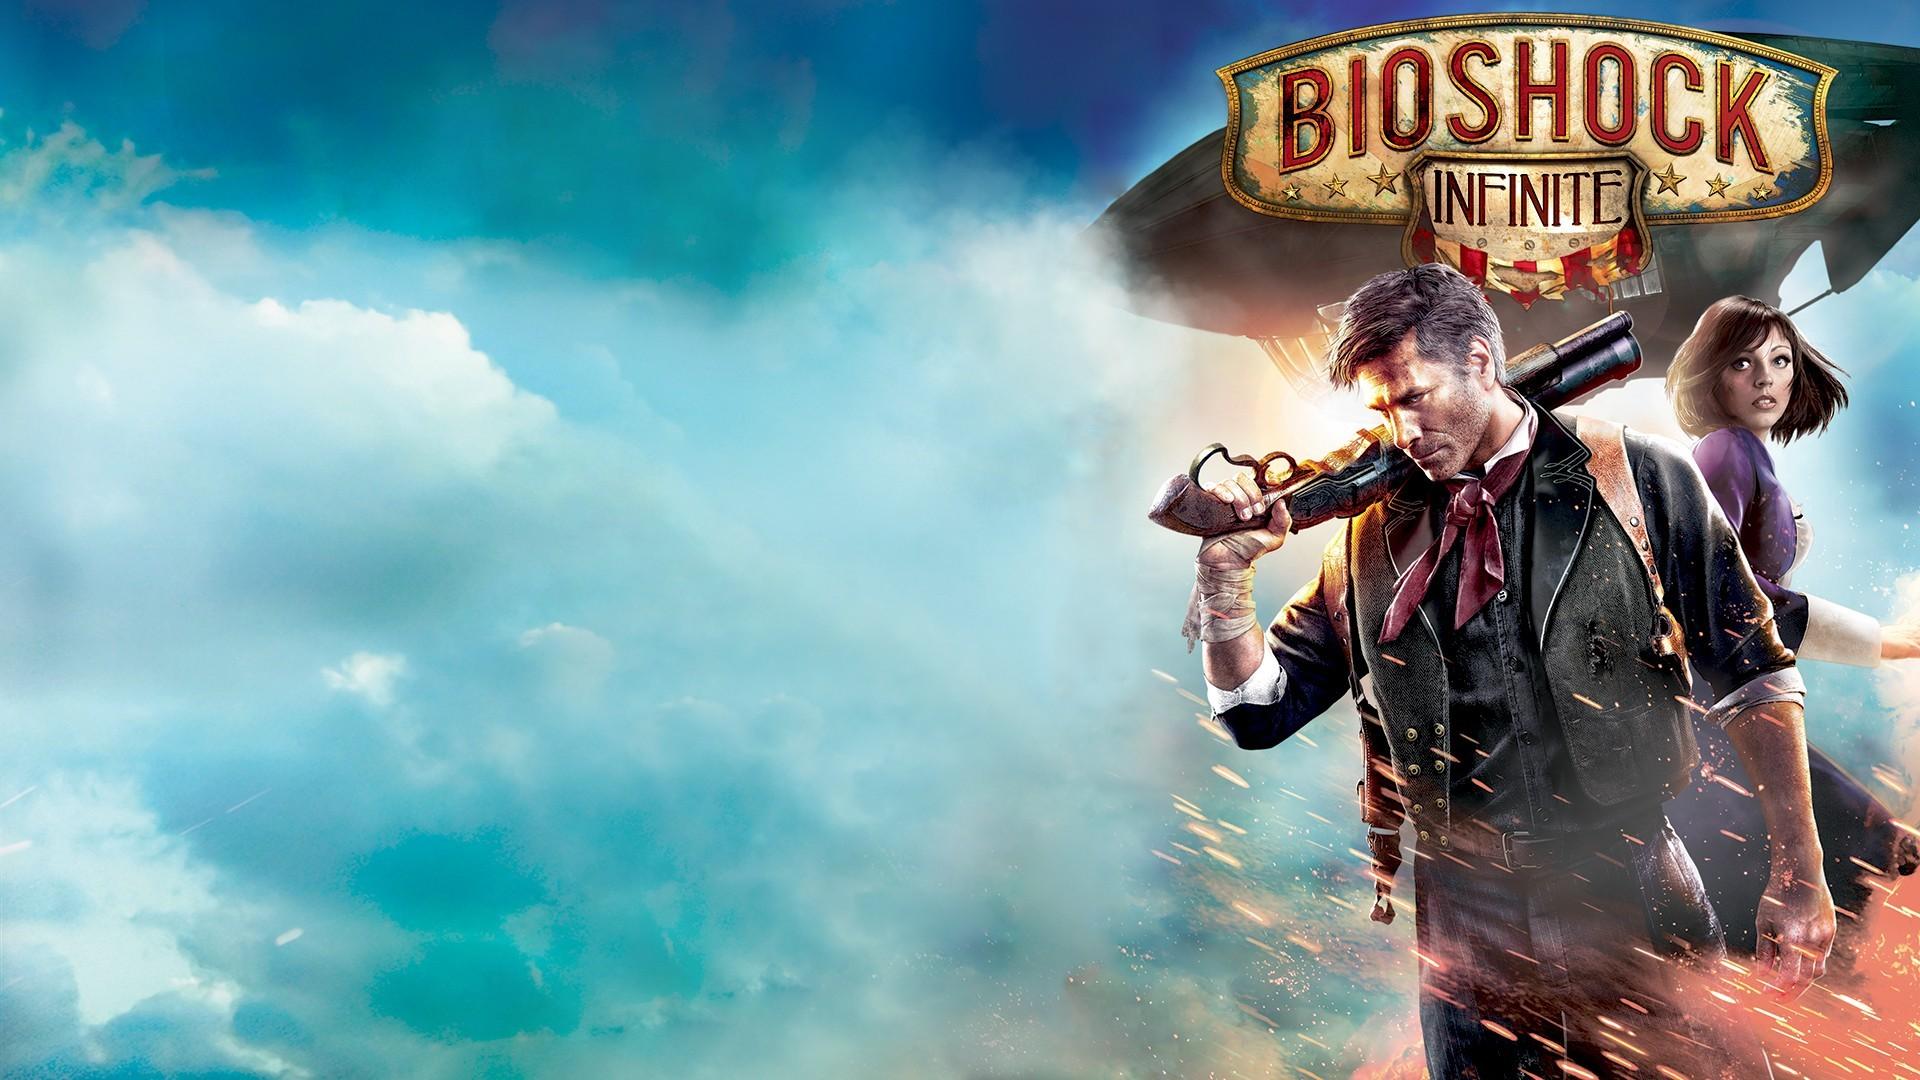 anime BioShock Elizabeth BioShock BioShock Infinite Booker DeWitt screenshot computer wallpaper 88741